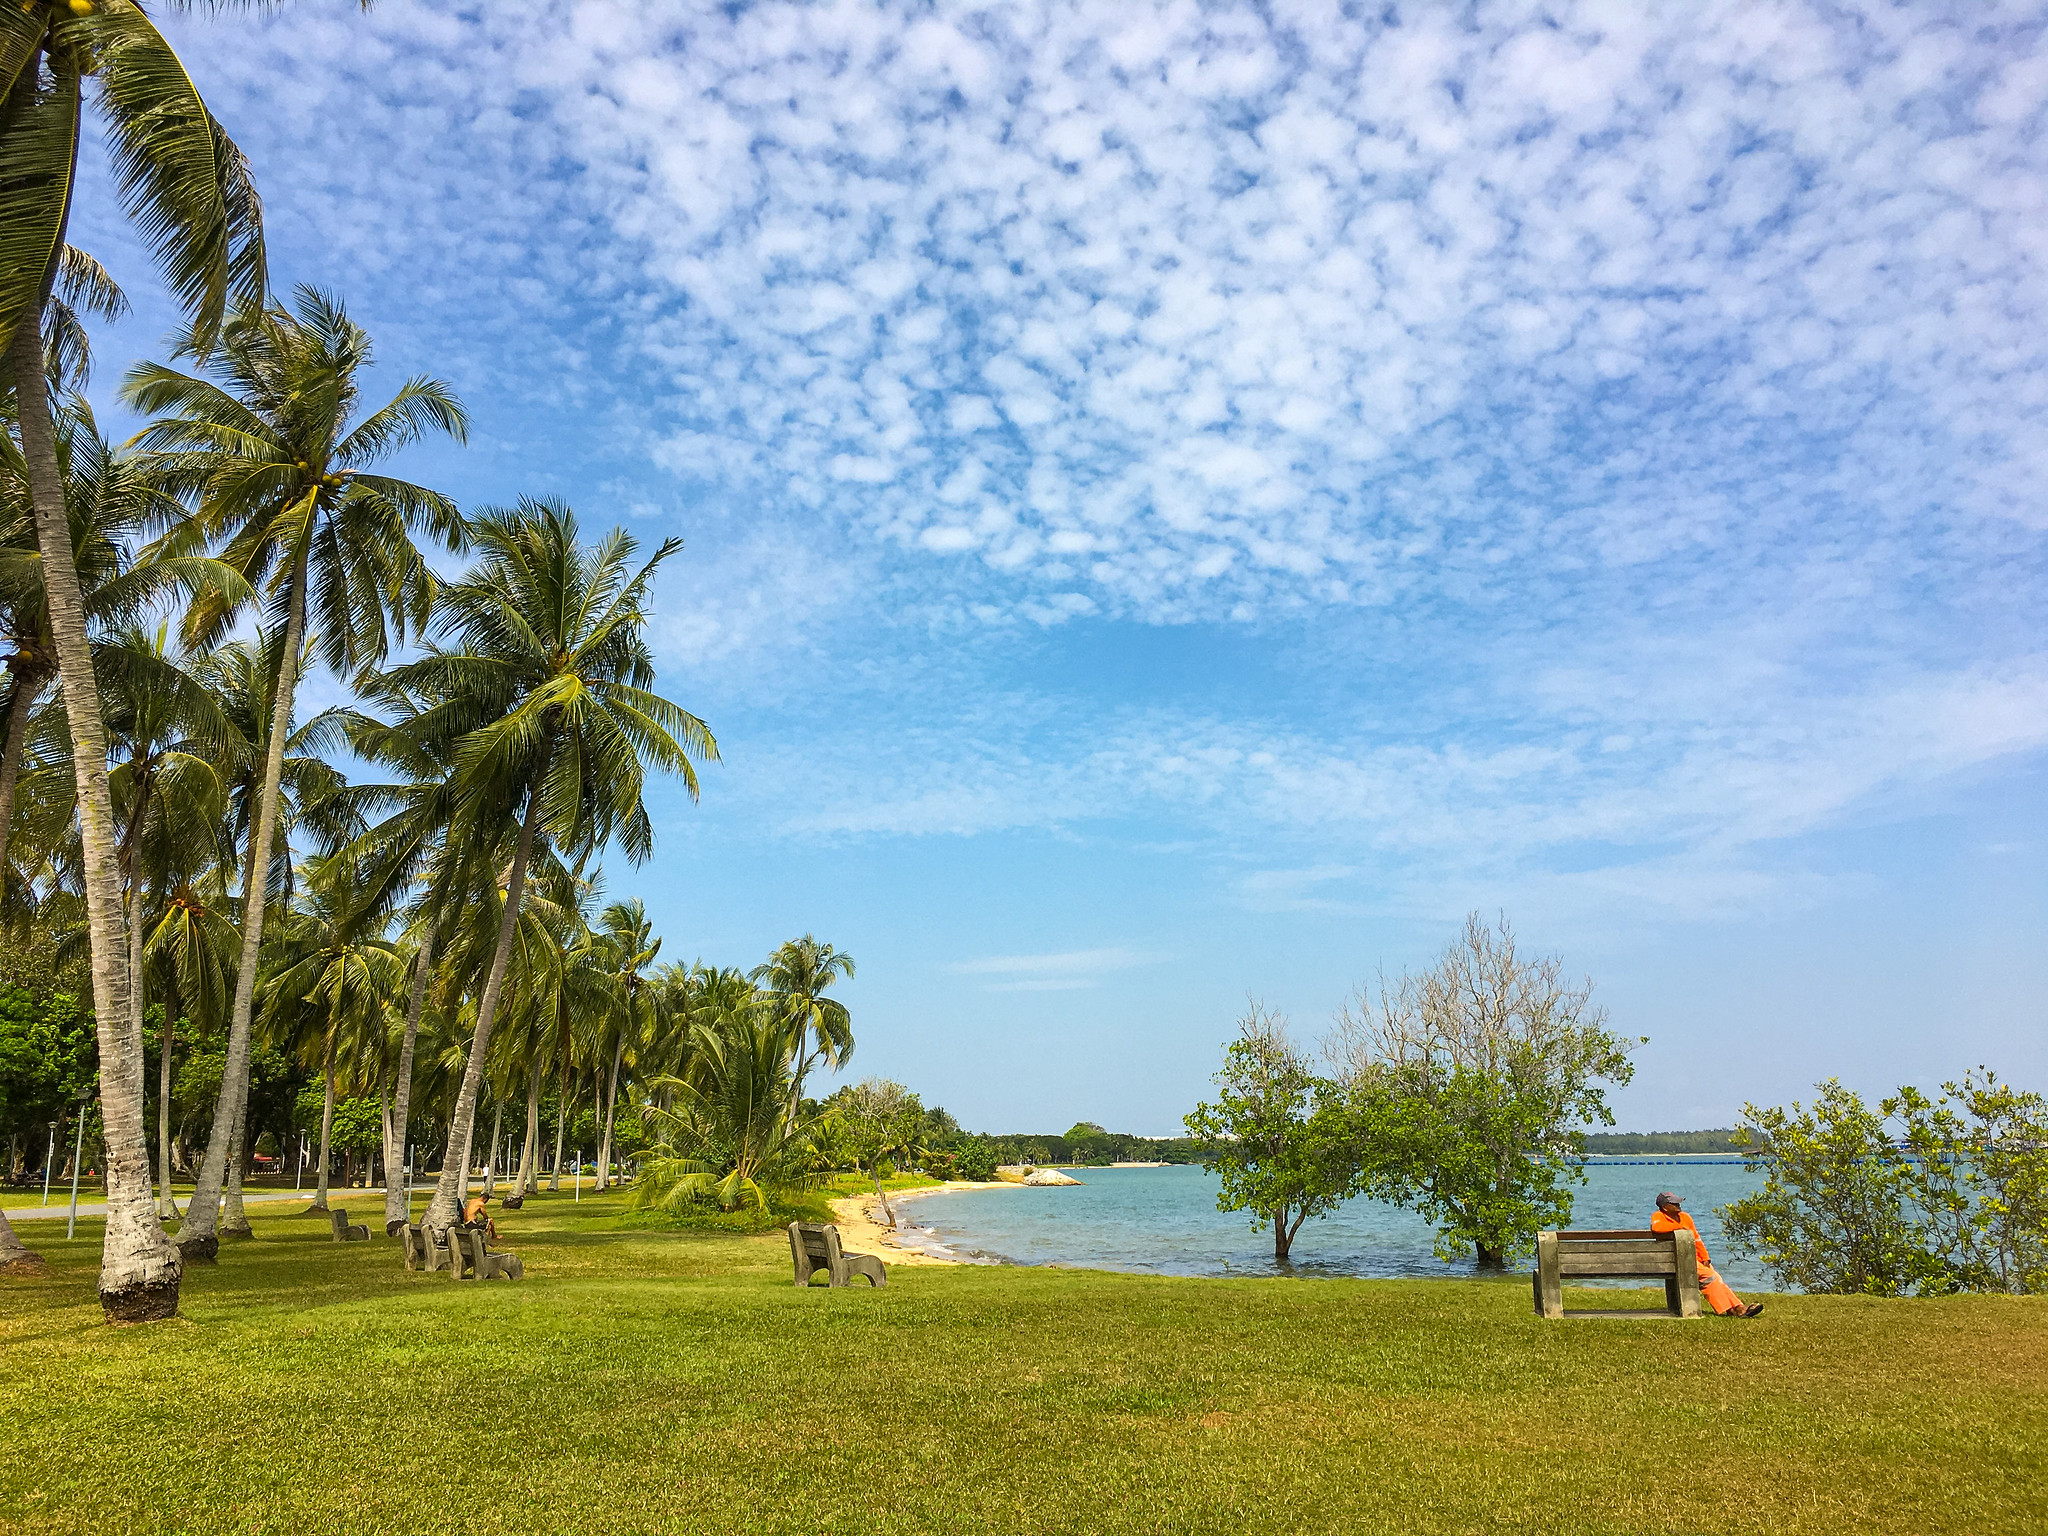 Best Beaches in Singapore - Top 10 Singapore Beaches